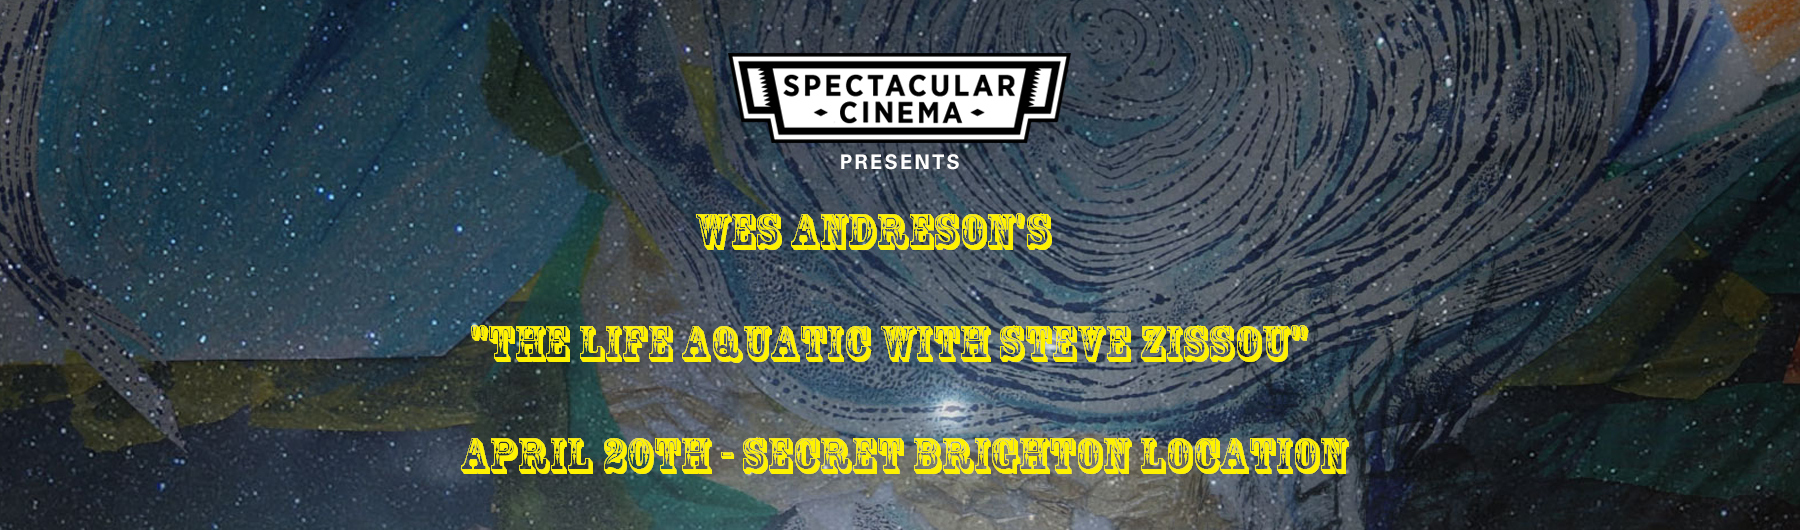 Spectacular Cinema Presents - The Life Aquatic of Steve Zissou - Brighton